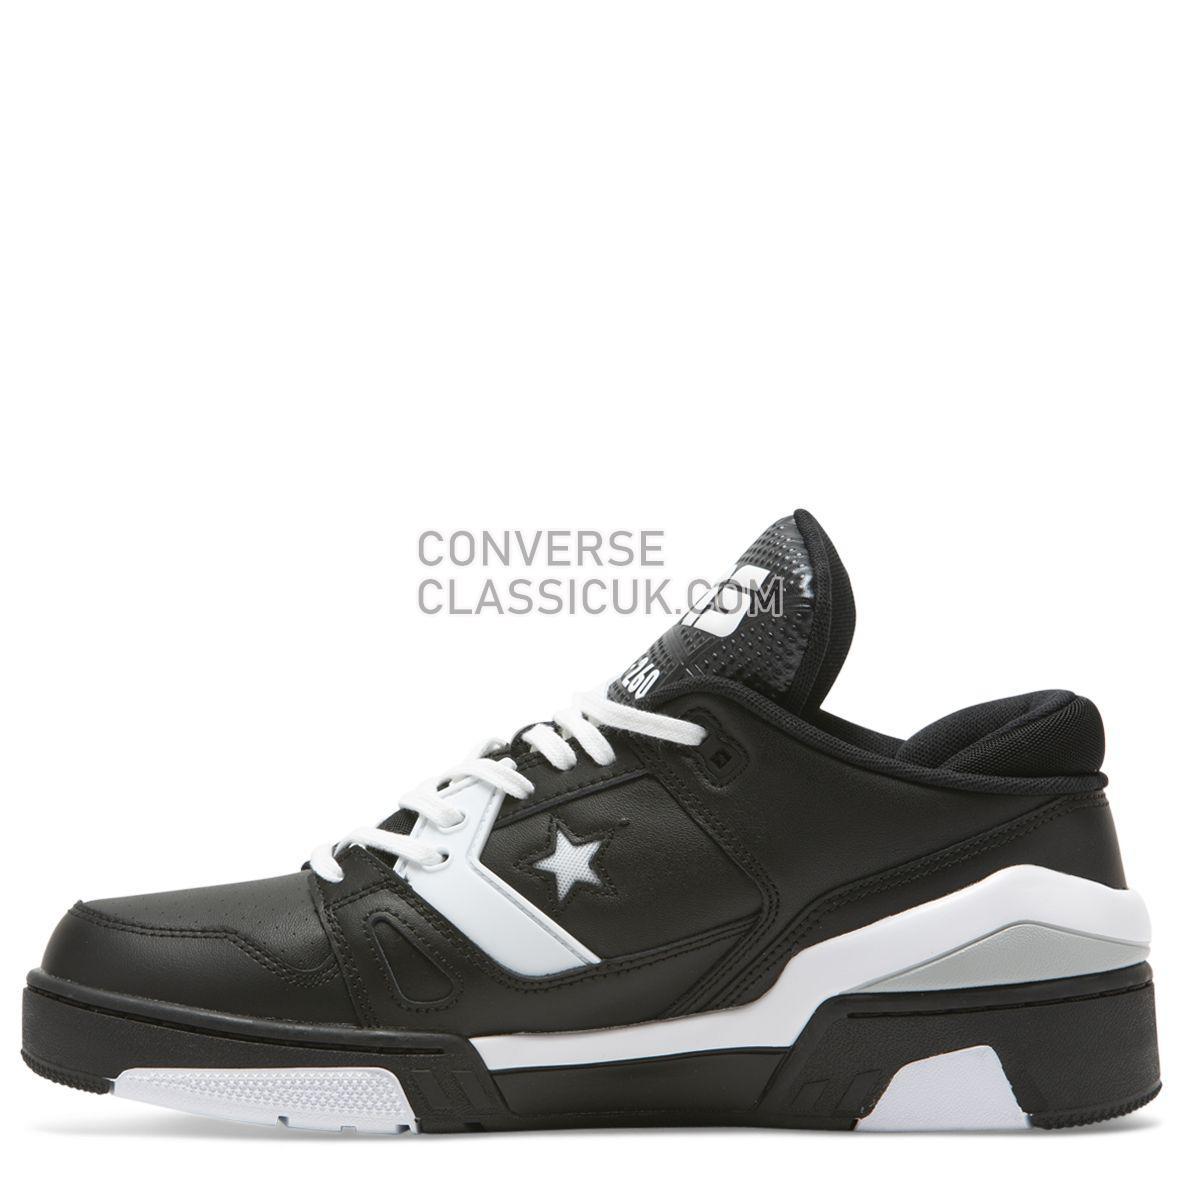 Converse ERX 260 Archive Alive Low Top Black Mens 165045 Black/White/Dolphin Shoes